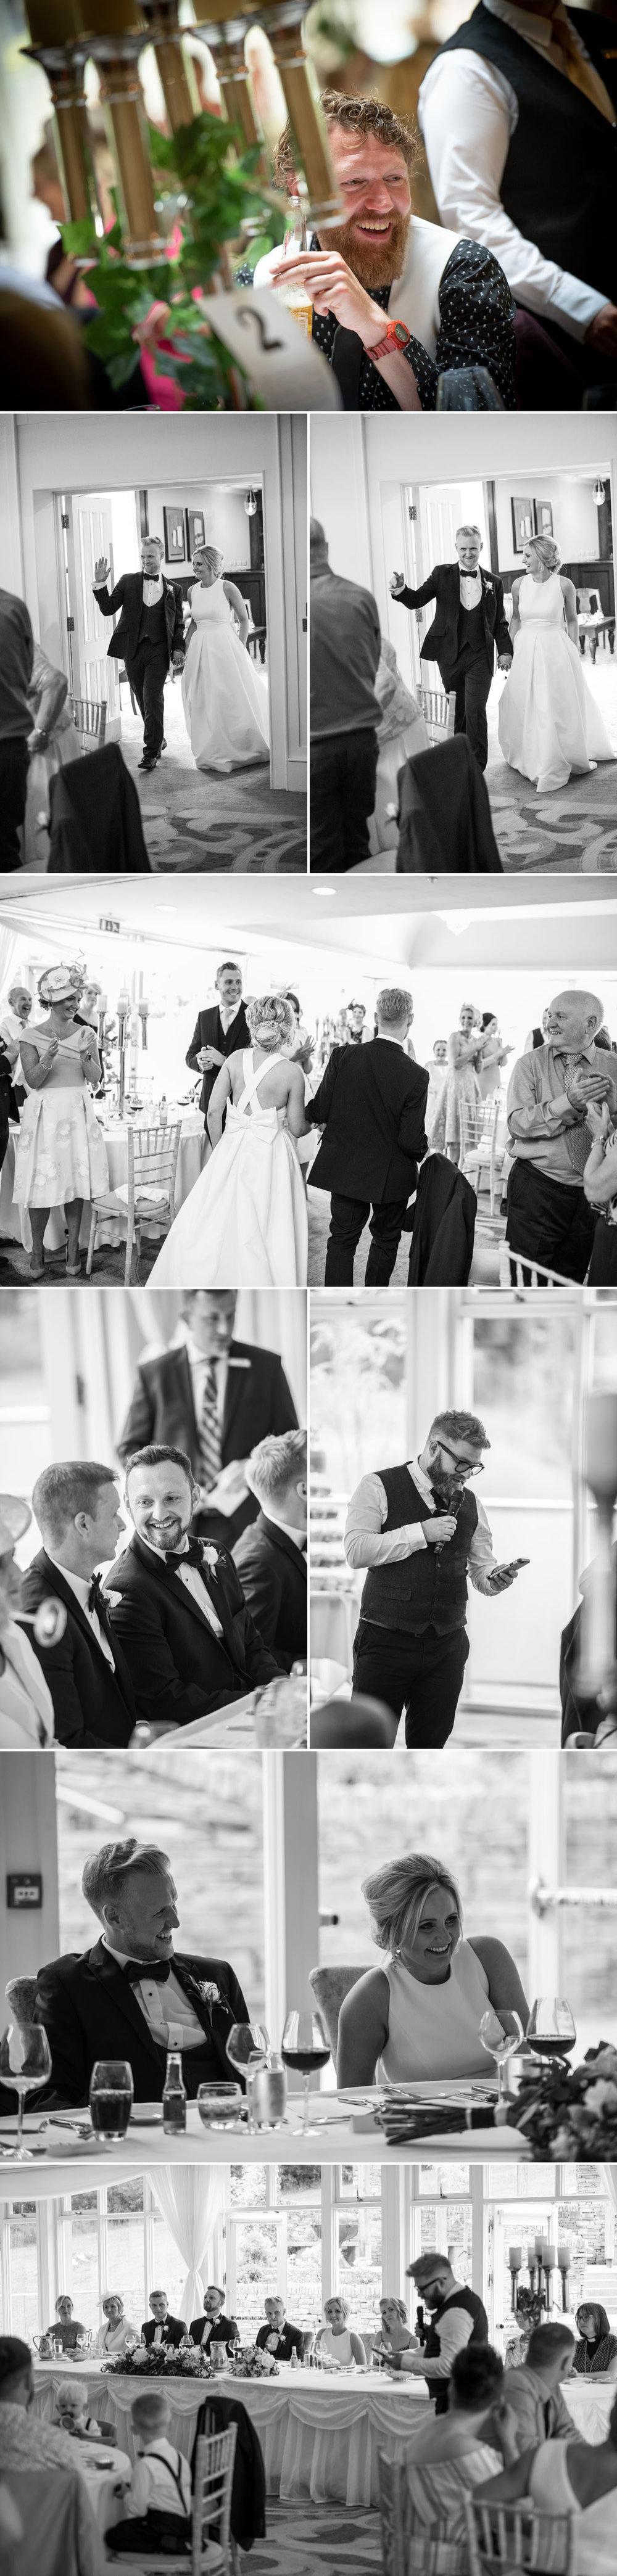 best wedding photographers northern ireland 16.jpg